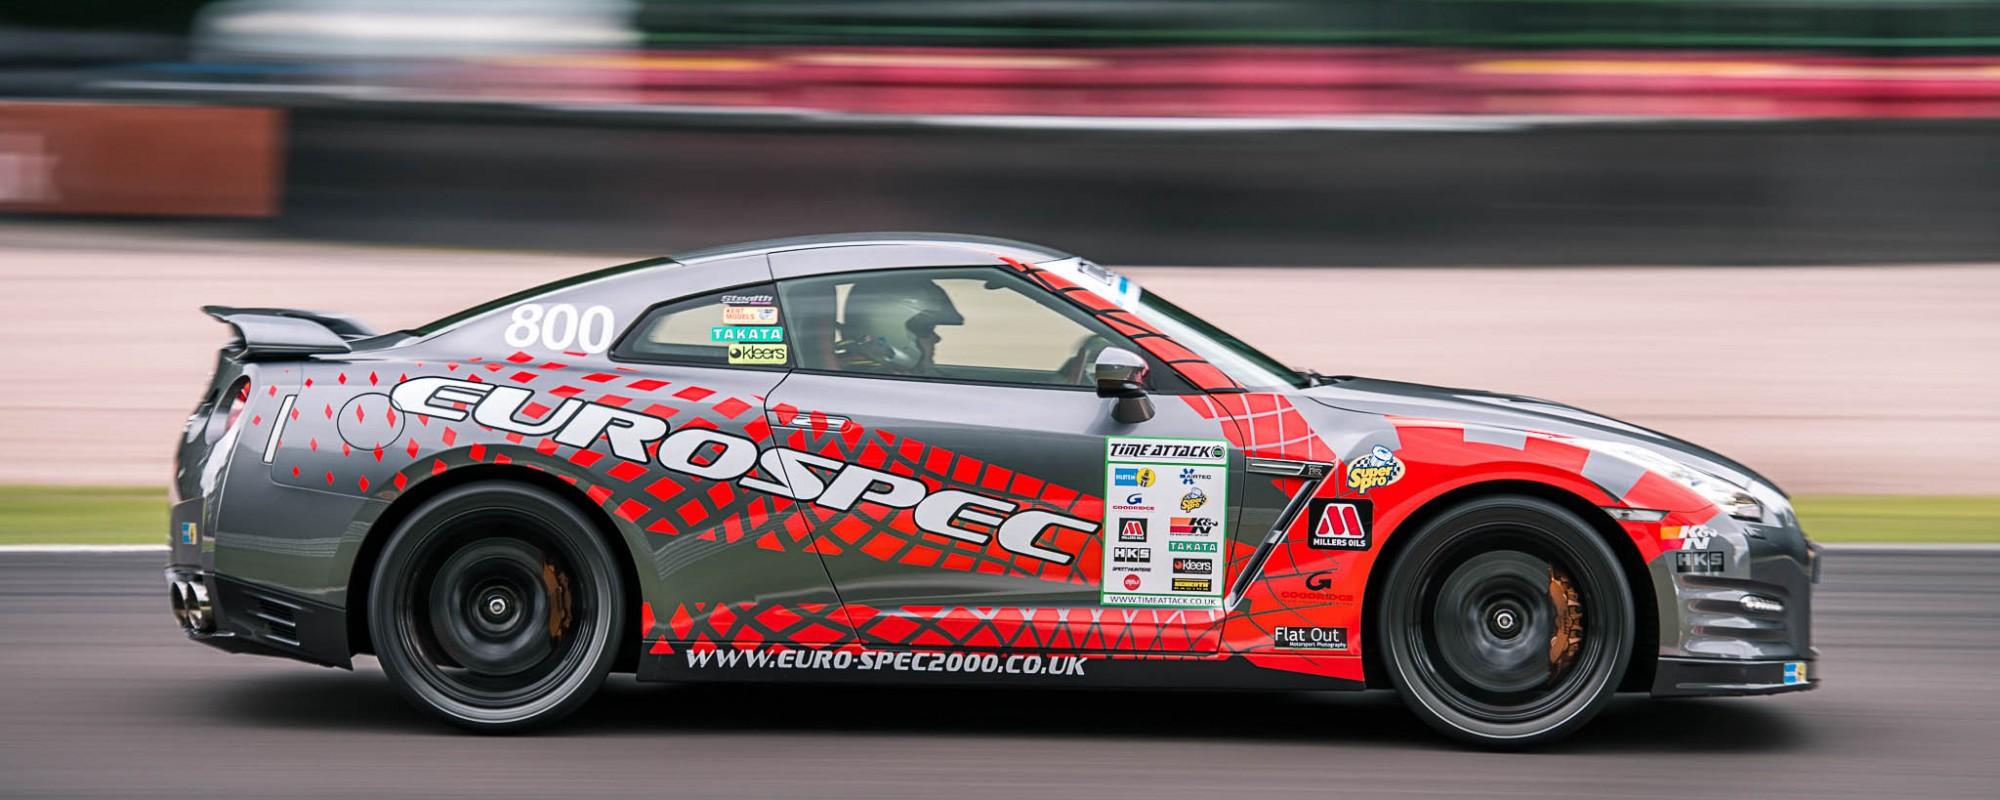 Nissan GTR R35 Eurospec